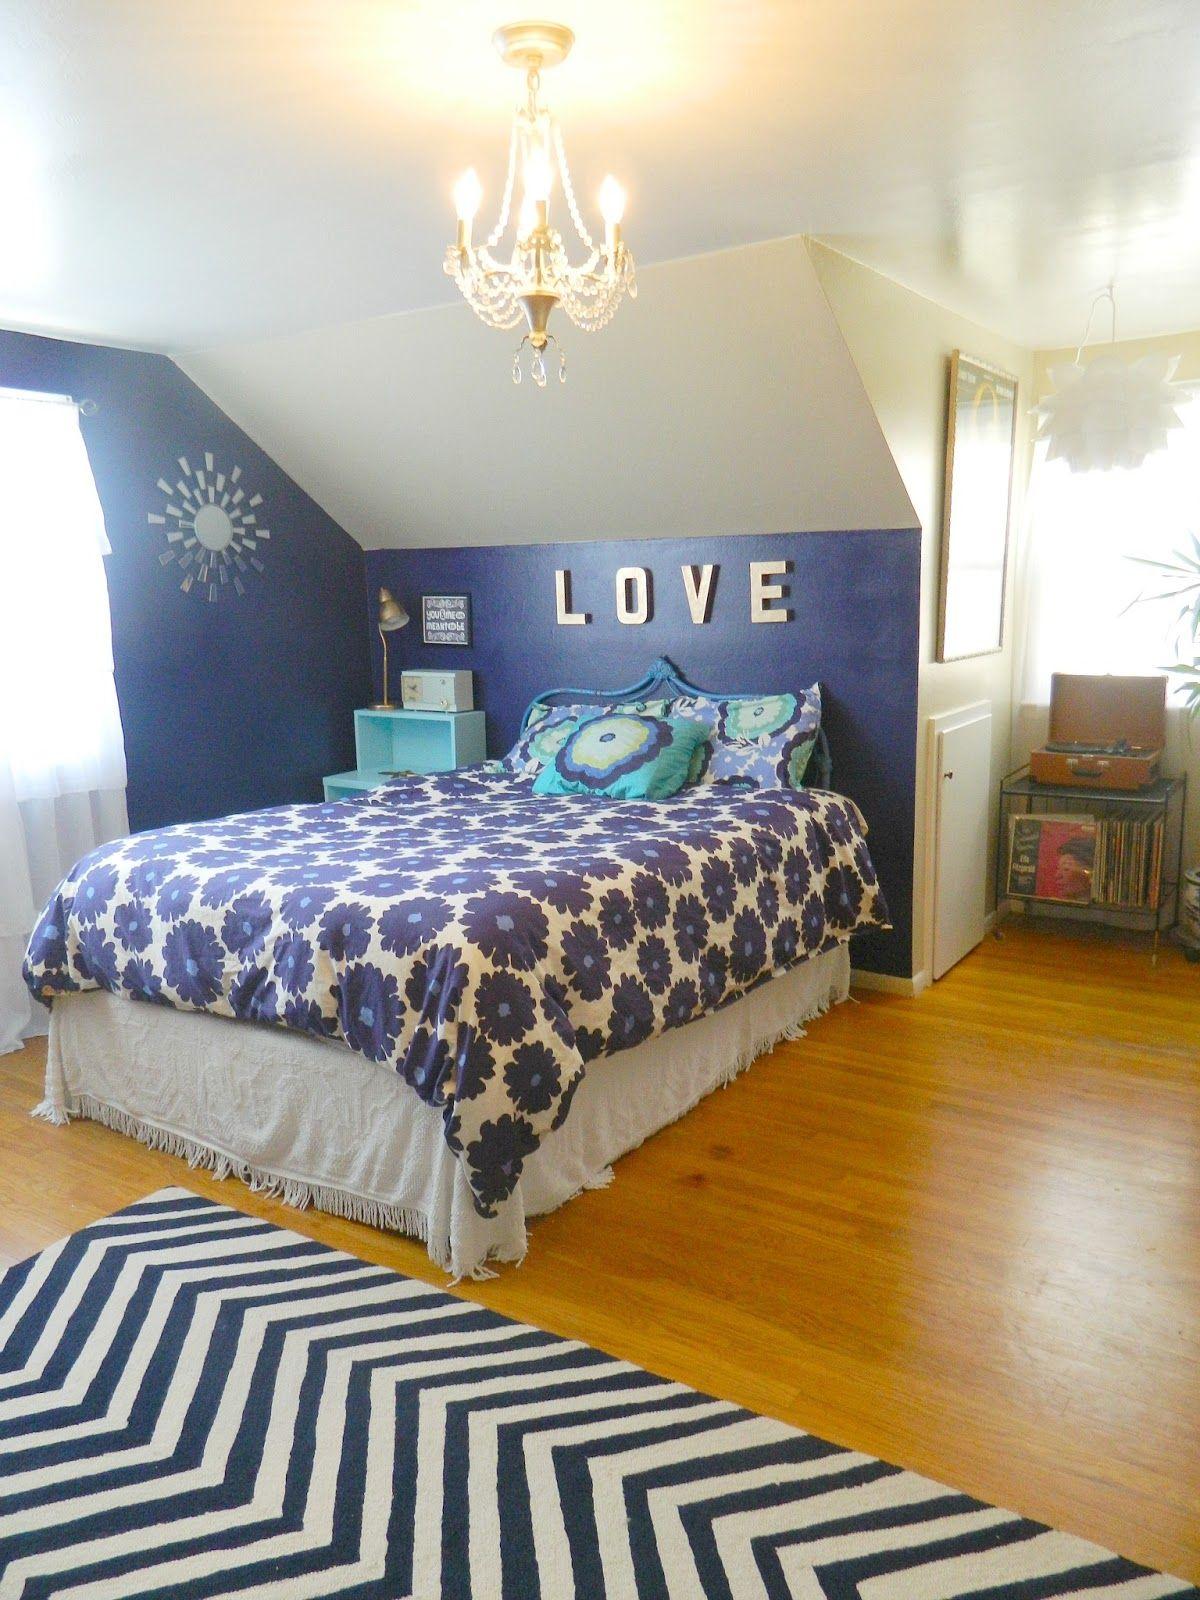 bett ohne rahmen best easy peasy bett ohne rahmen with. Black Bedroom Furniture Sets. Home Design Ideas